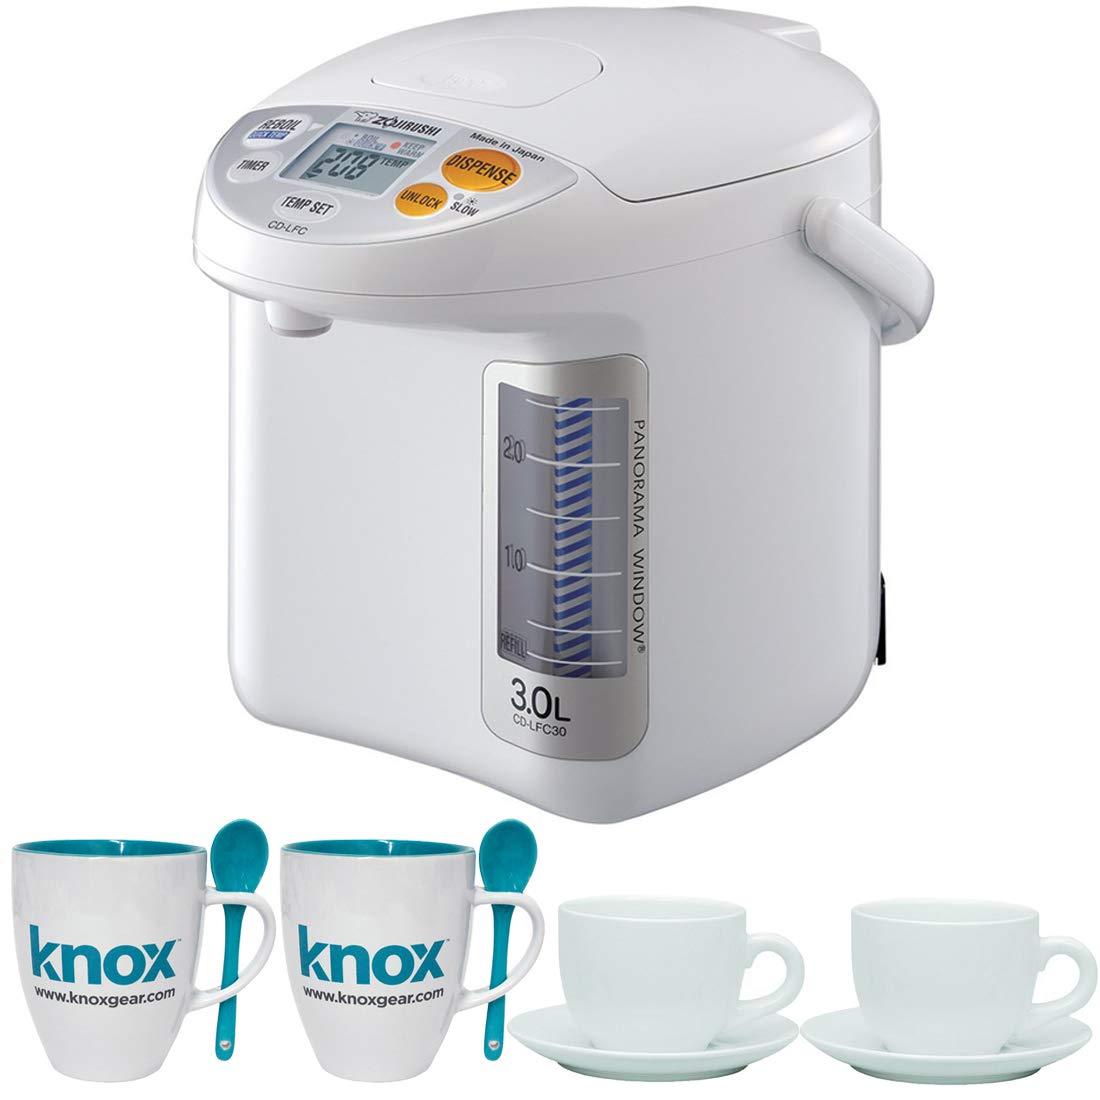 Zojirushi CD-LFC30 Panorama Window Micom Water Boiler and Warmer, 101 oz/3.0 L, White Includes 2 Espresso Cups and 2 Mugs Bundle